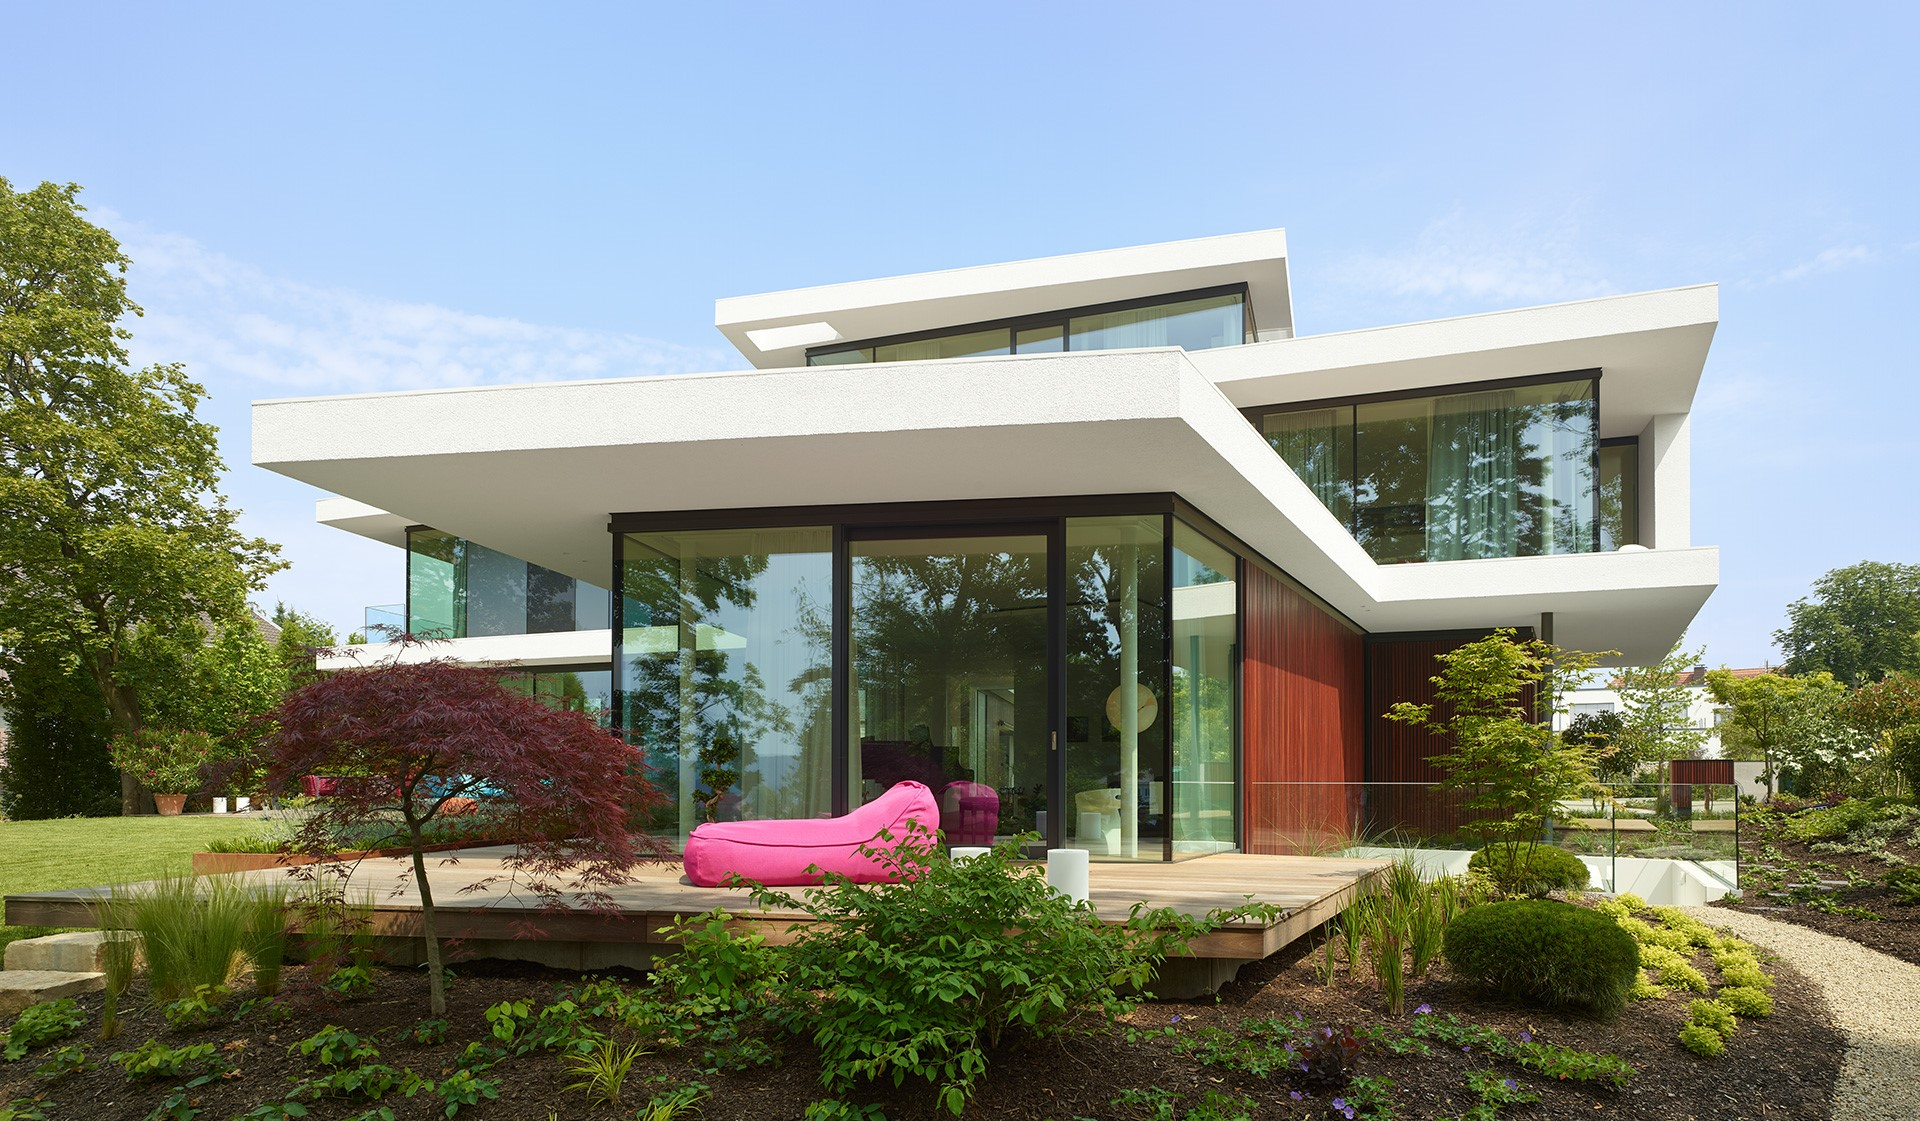 Villa in Saarbruecken Weber Hummel Architekten 2